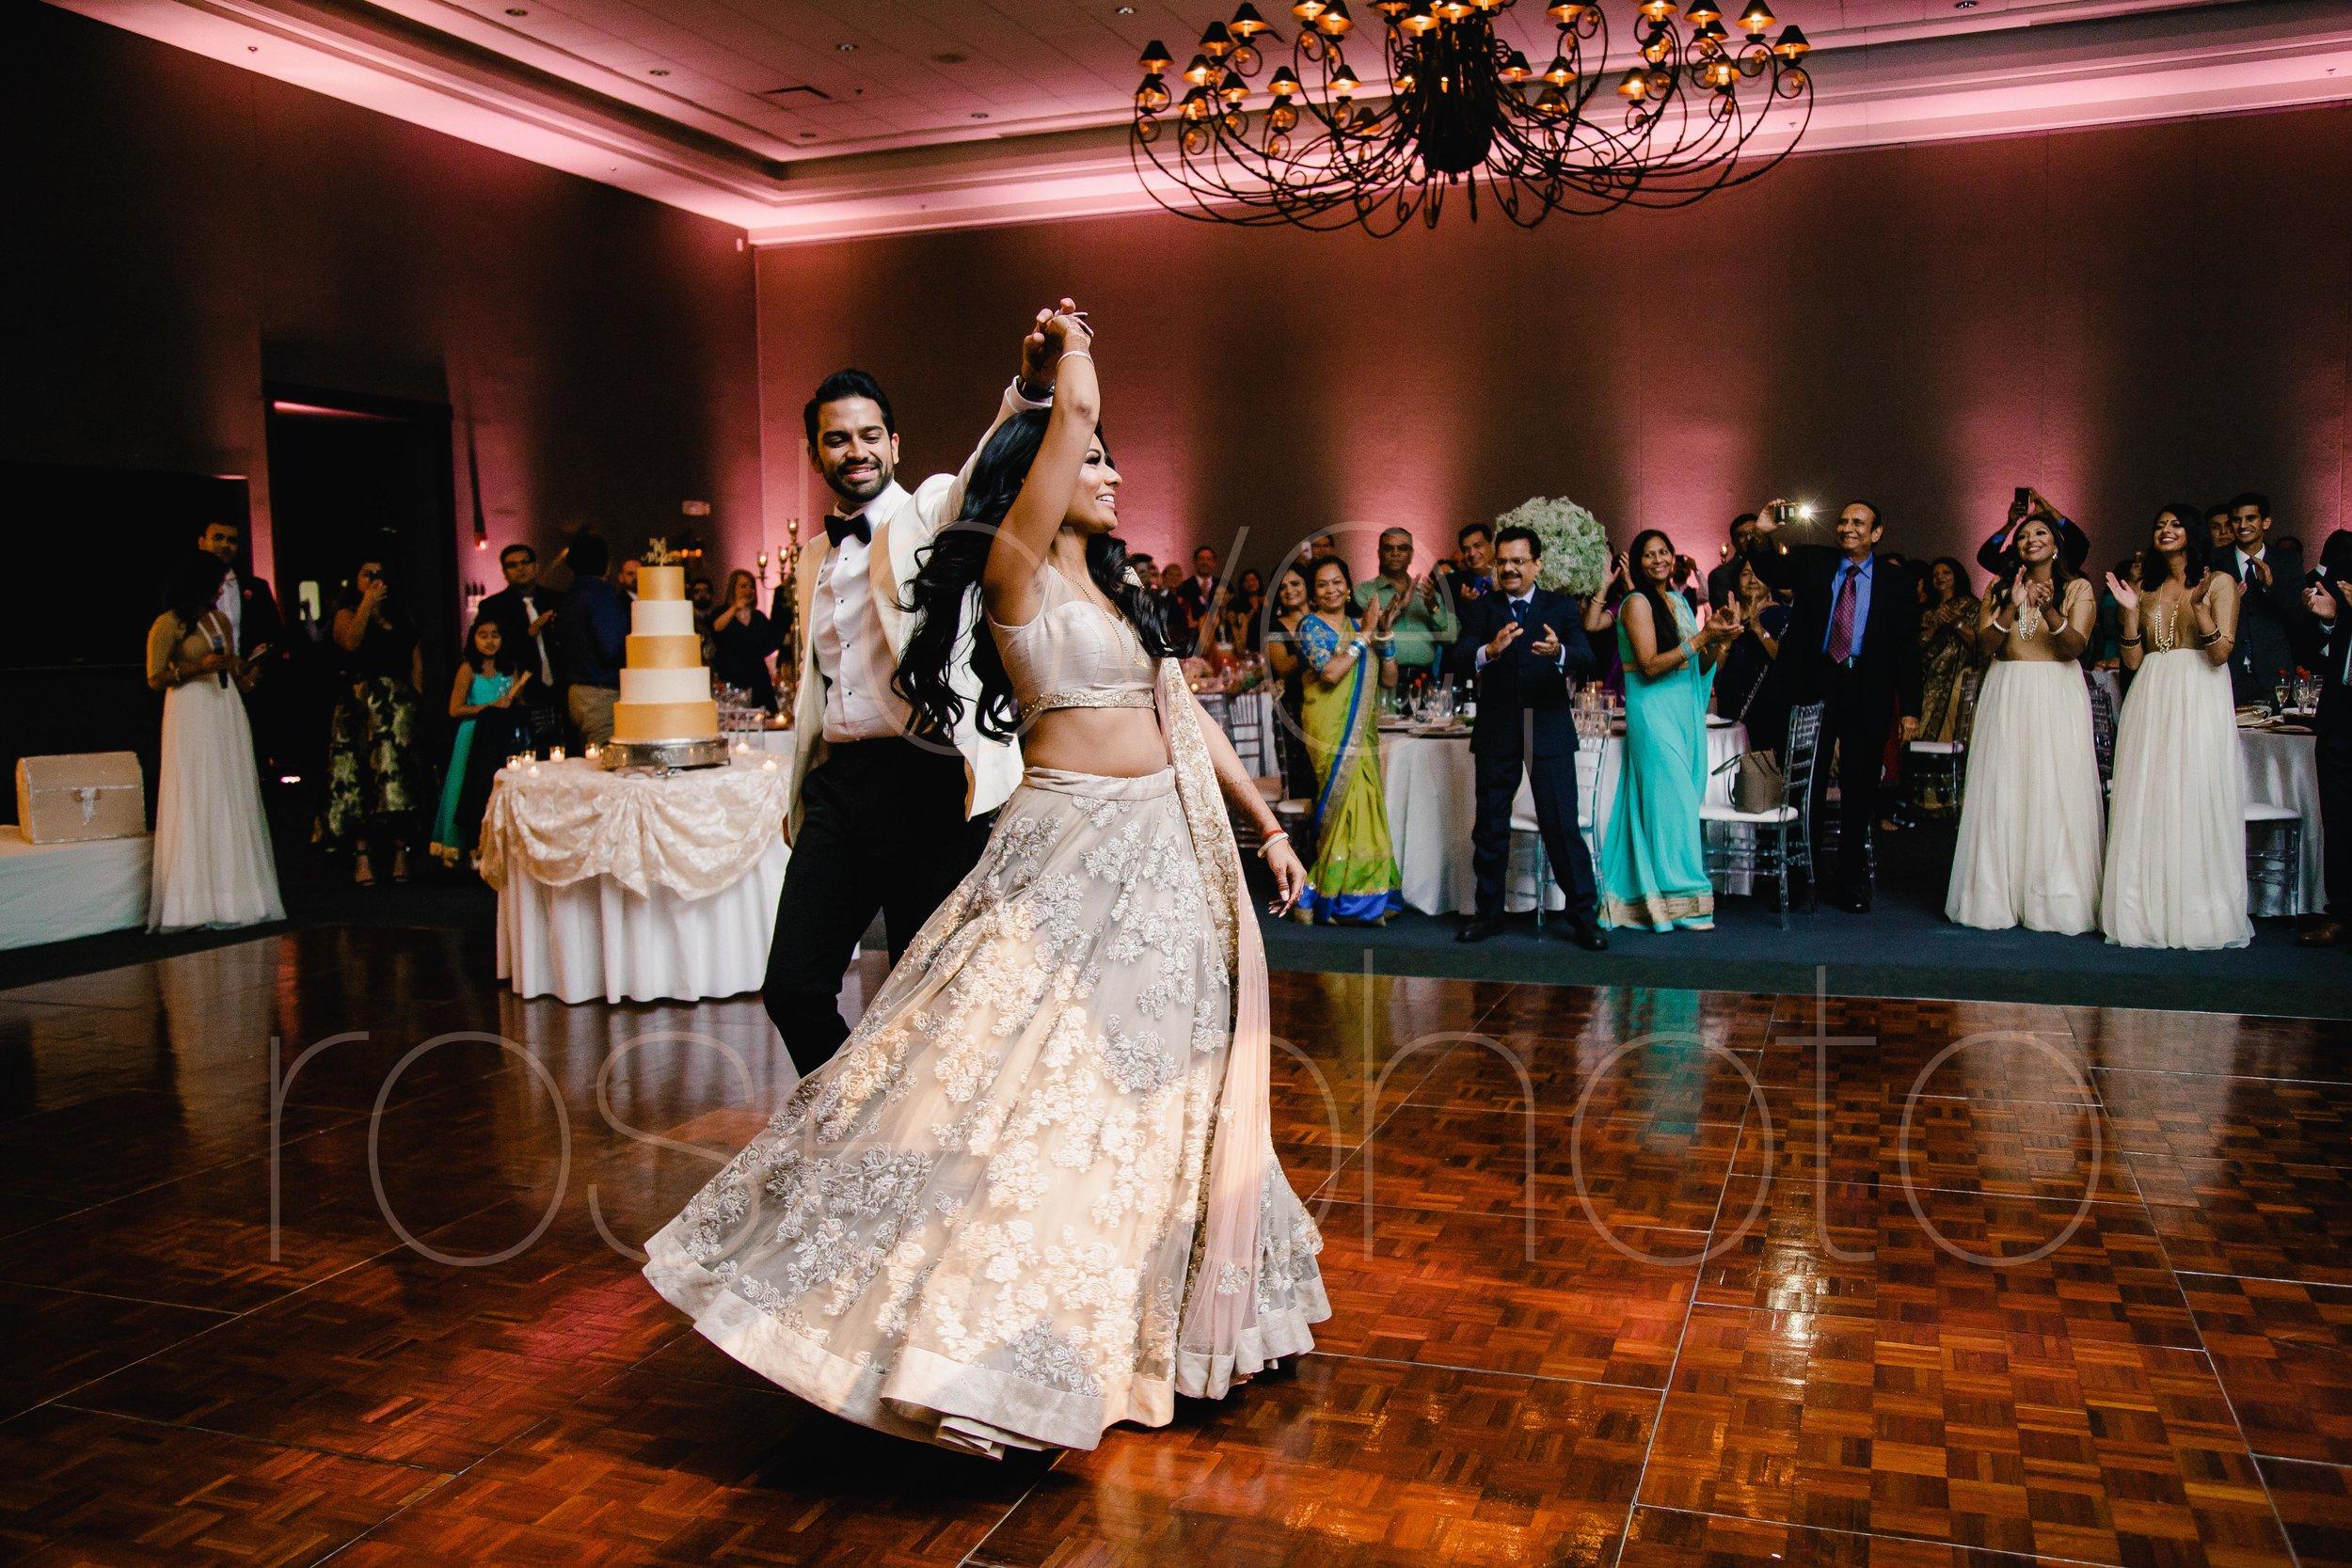 Chicago Indian Wedding best photography lifestyle wedding portrait luxury wedding-53.jpg